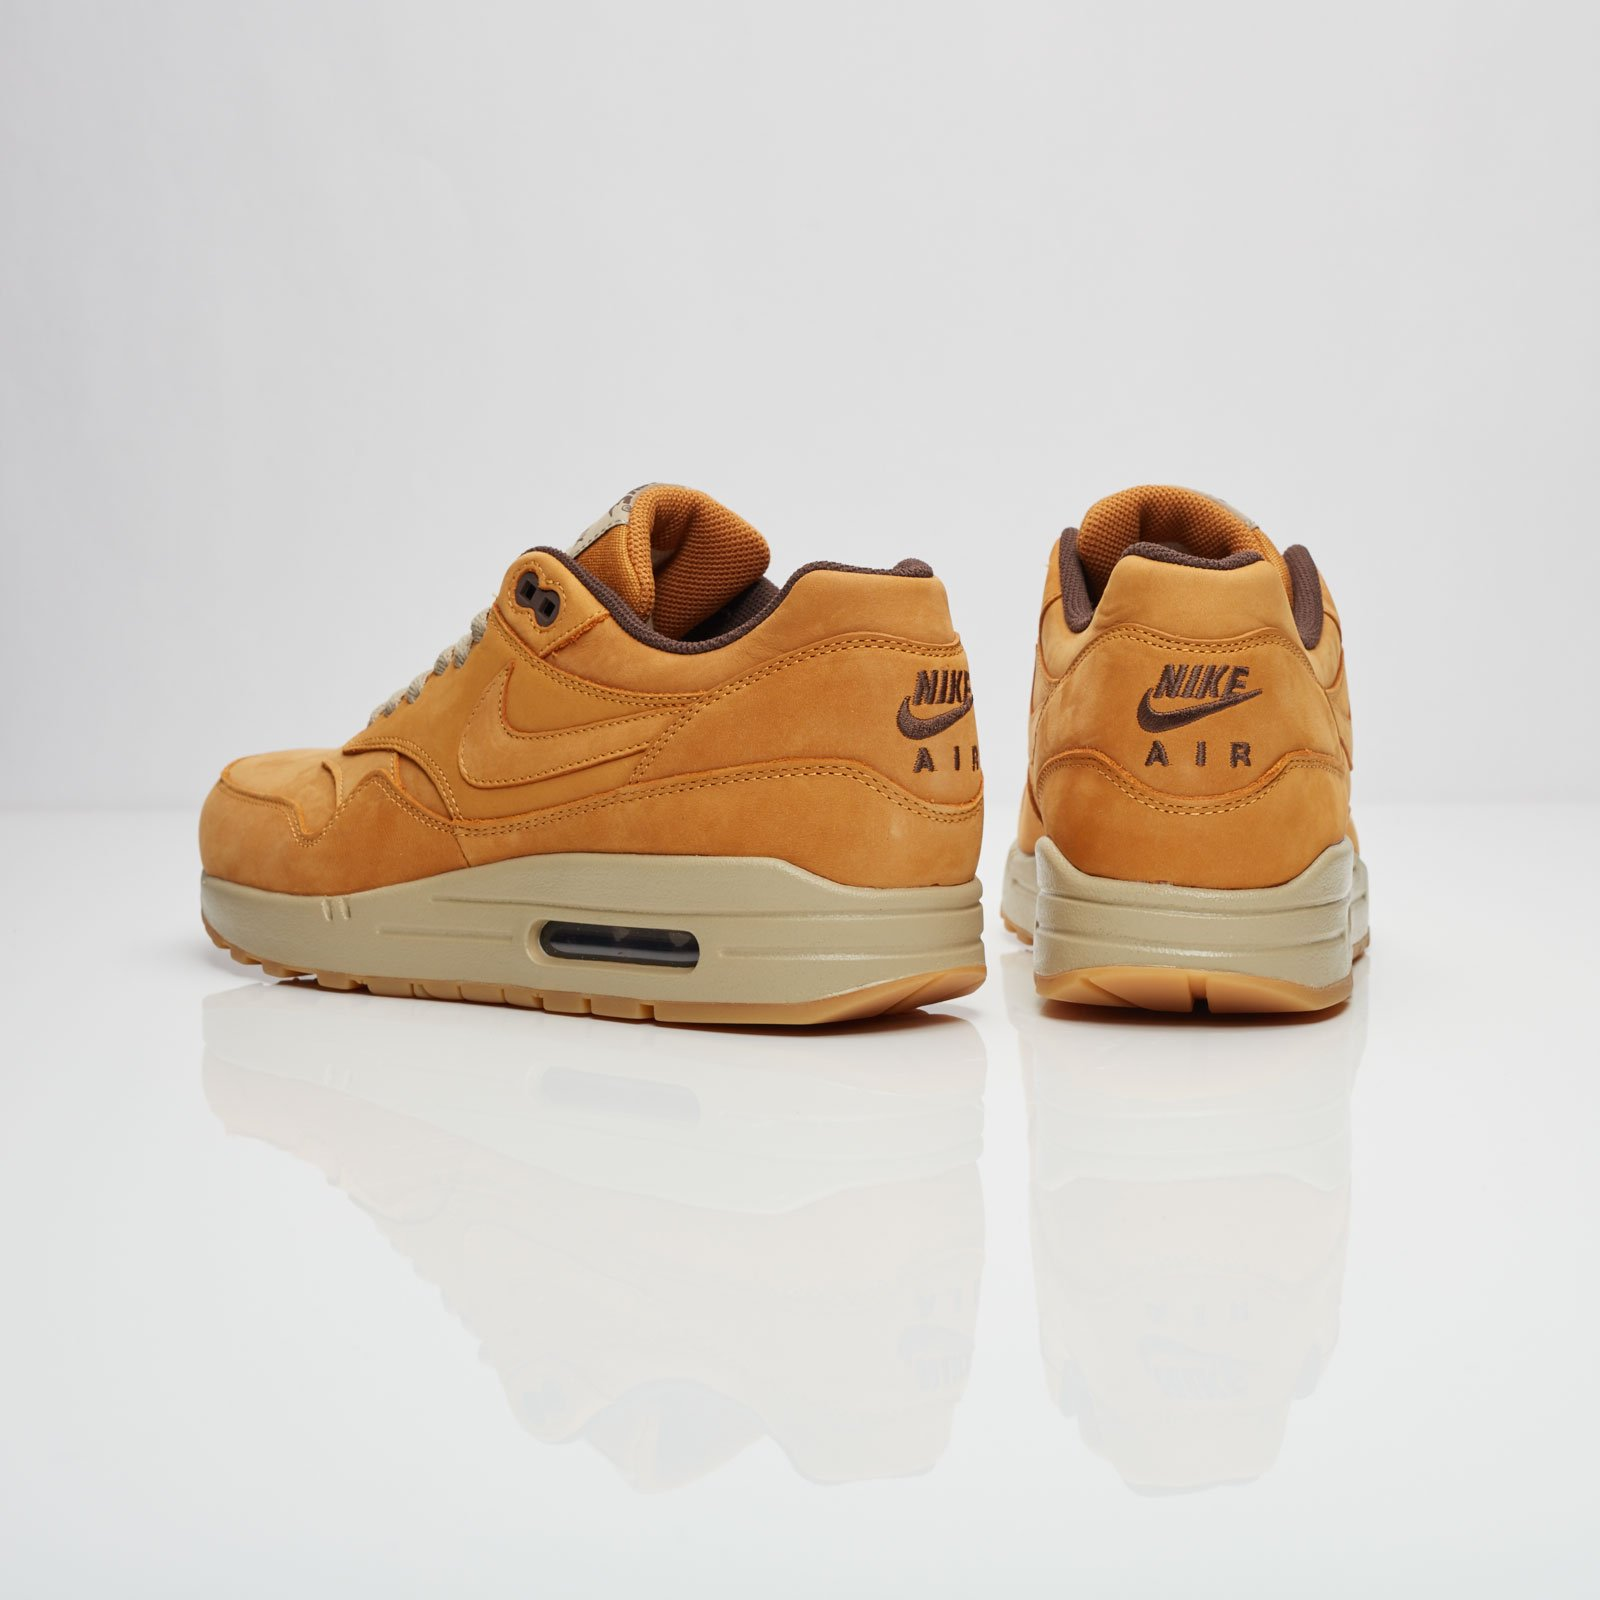 Nike Air Max 1 Leather Premium - 705282